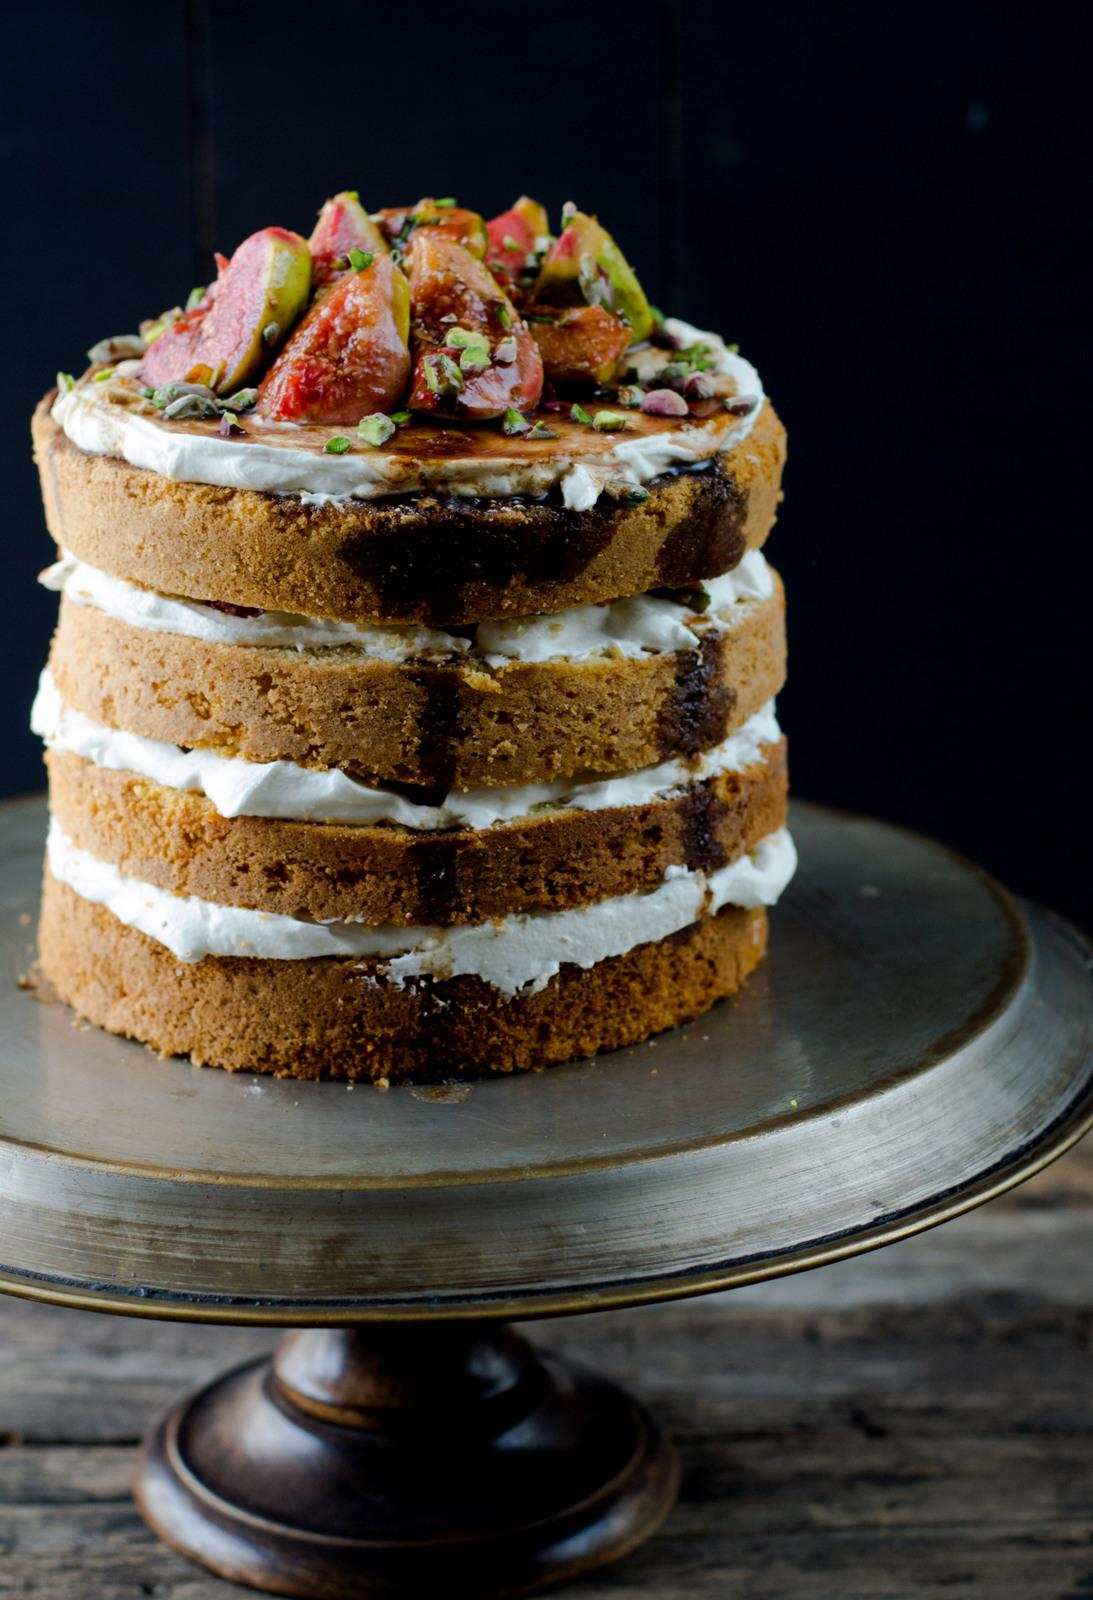 Buttermilk Cake Layered With Mascarpone Amp Orange Balsamic